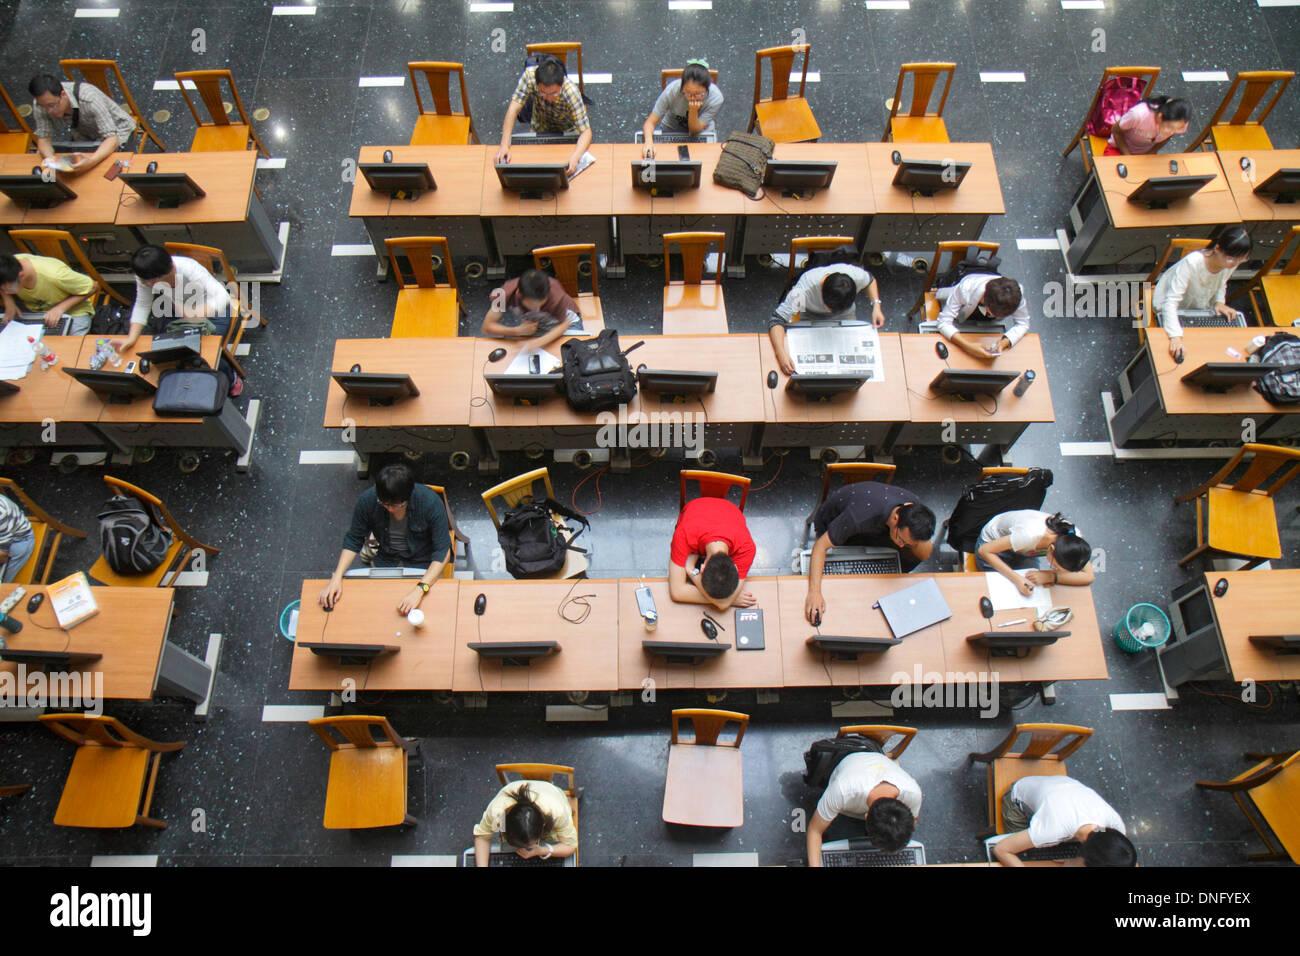 Cina Pechino Haidian District Università di Pechino PKU Beidà campus nel settore istruzione superiore biblioteca sala di studio monitor di computer in Internet Immagini Stock